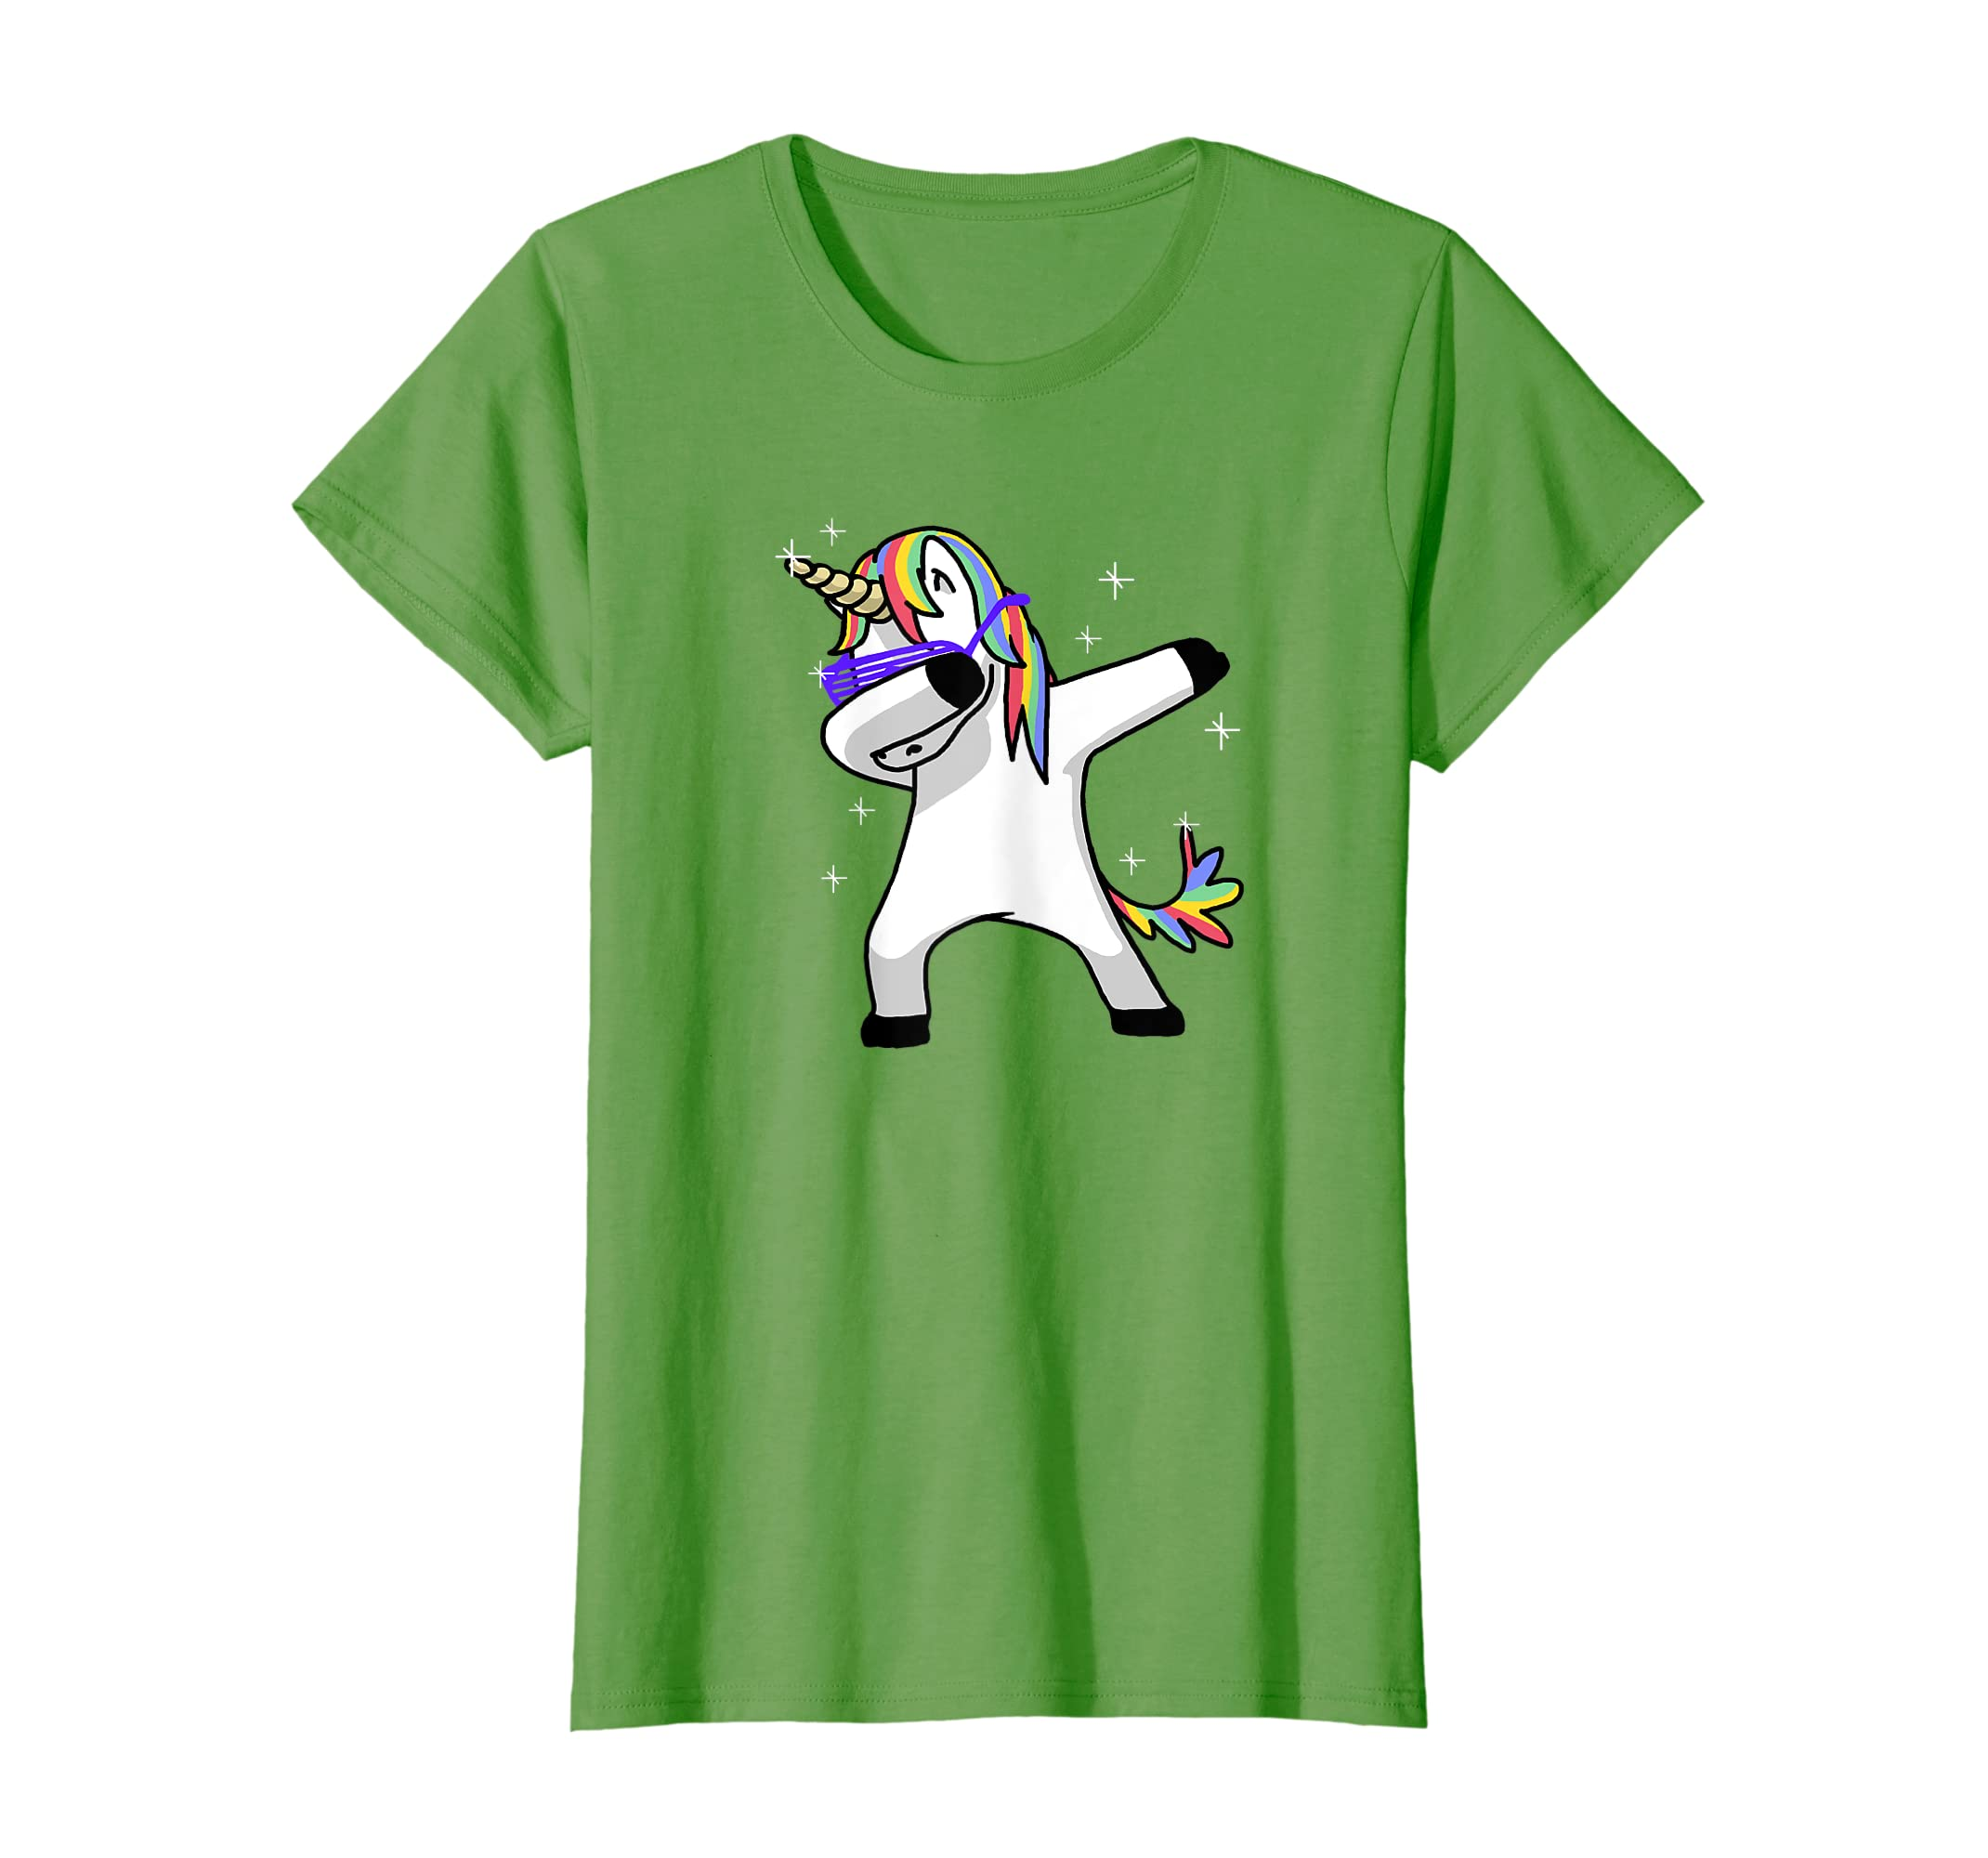 9ba28bd7420 Amazon.com  Dabbing Unicorn Shirt Dab Hip Hop Funny Magic  Clothing